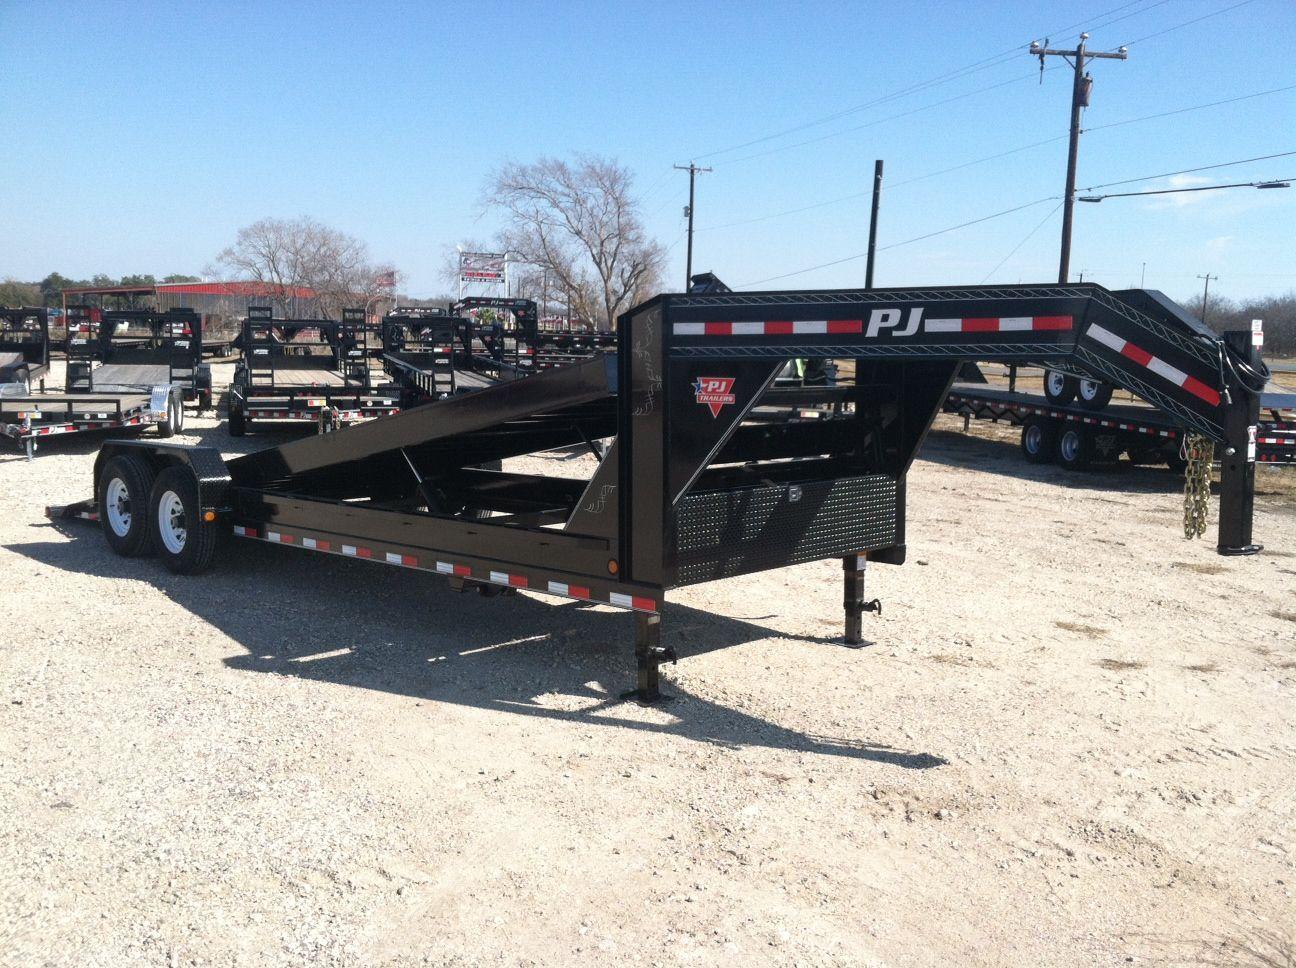 pj trailer gooseneck wiring diagram hobby caravan 12v trailers 22 carhauler loboy hydraulic full